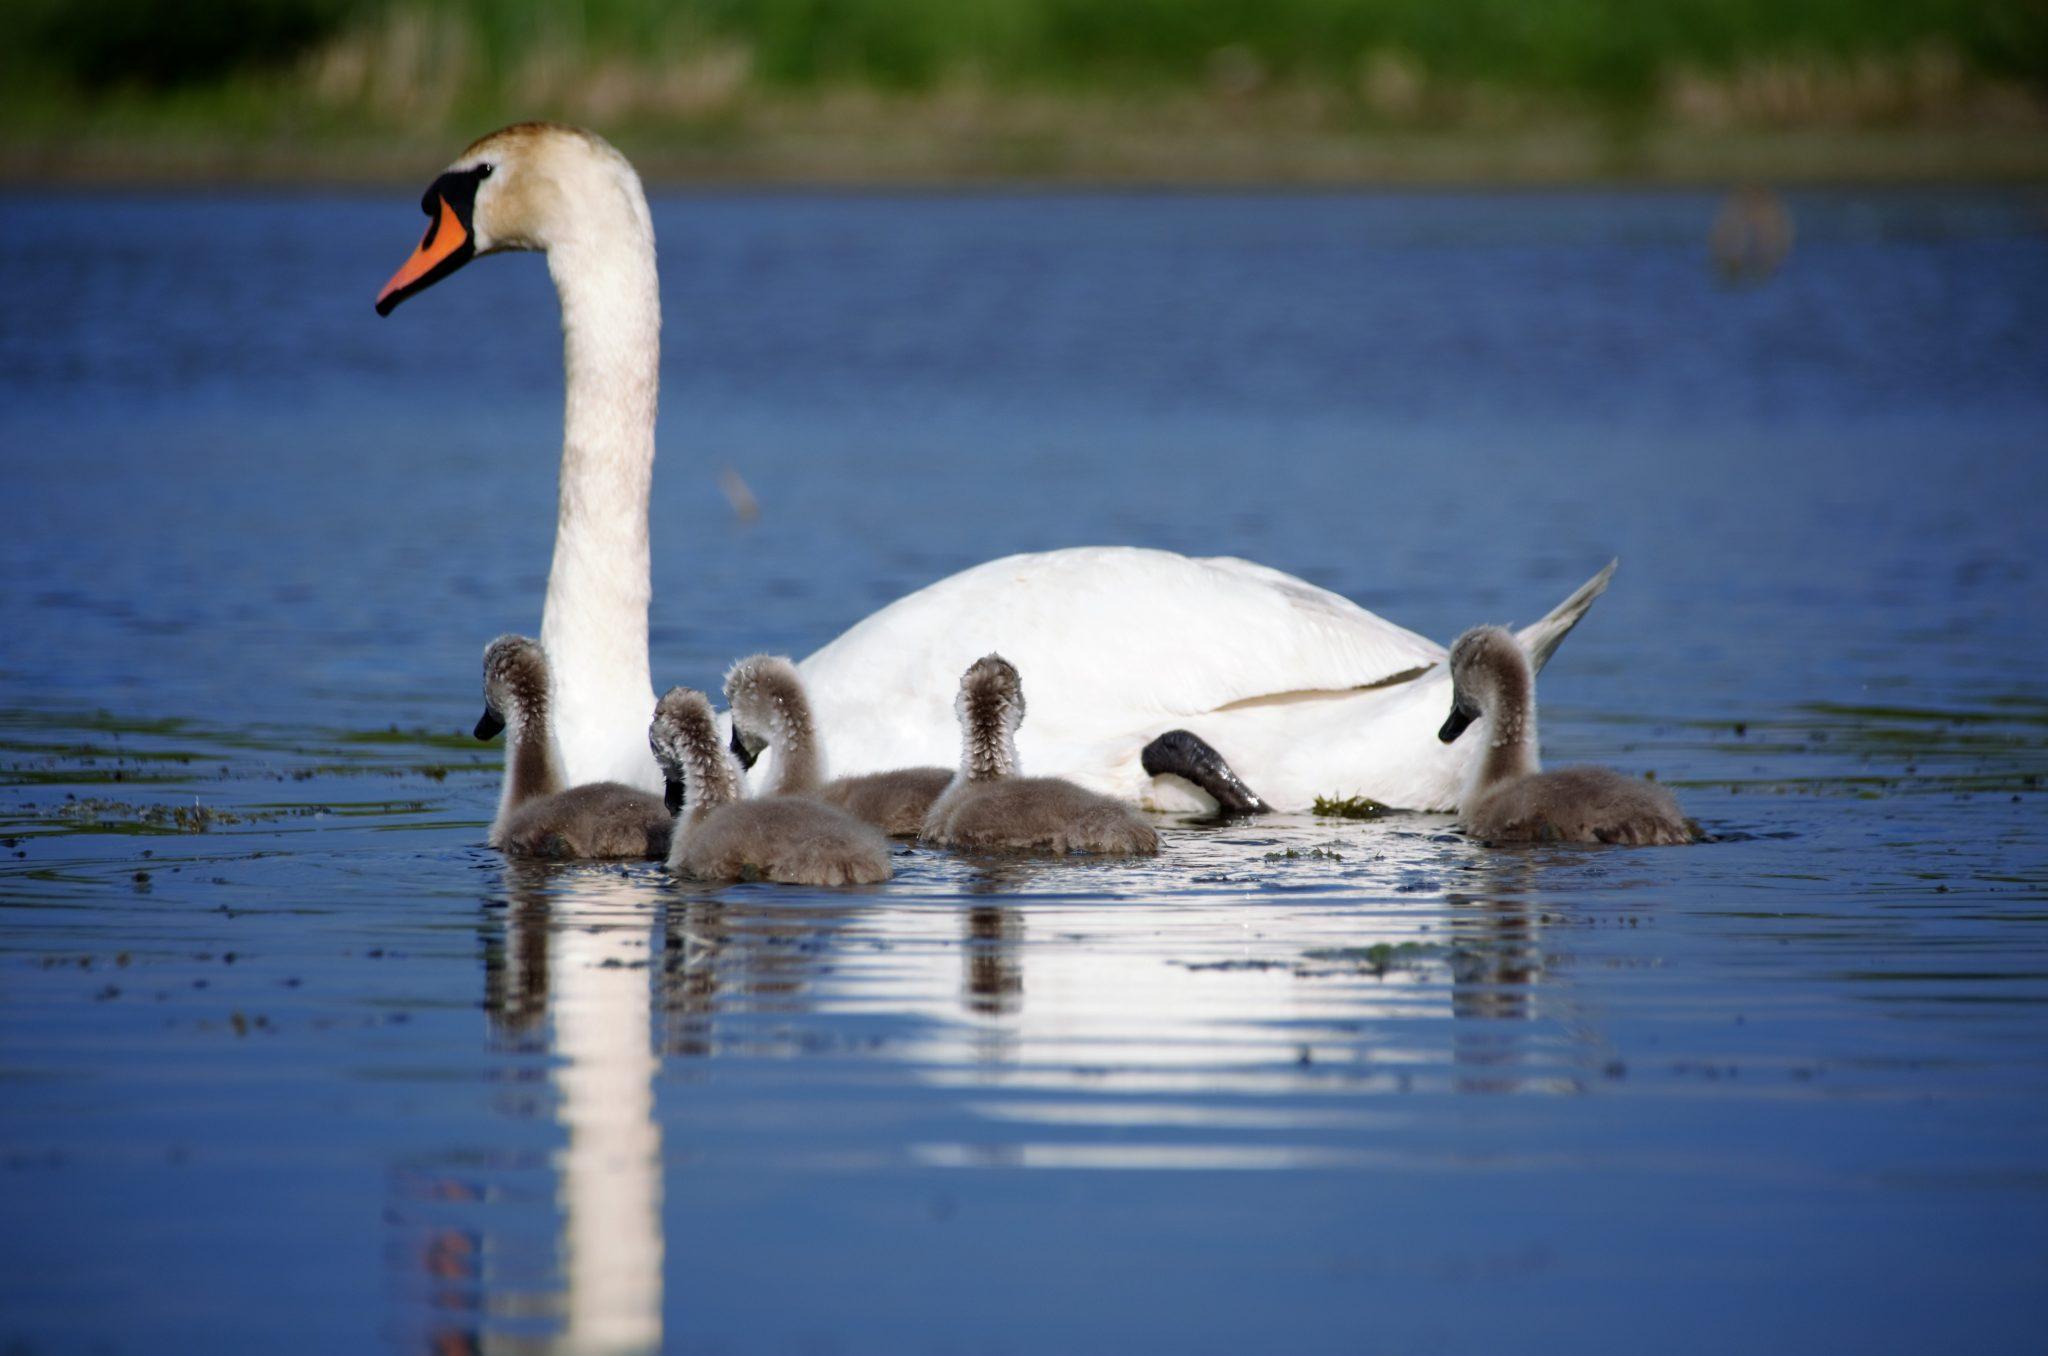 World Water Day - Mute swan